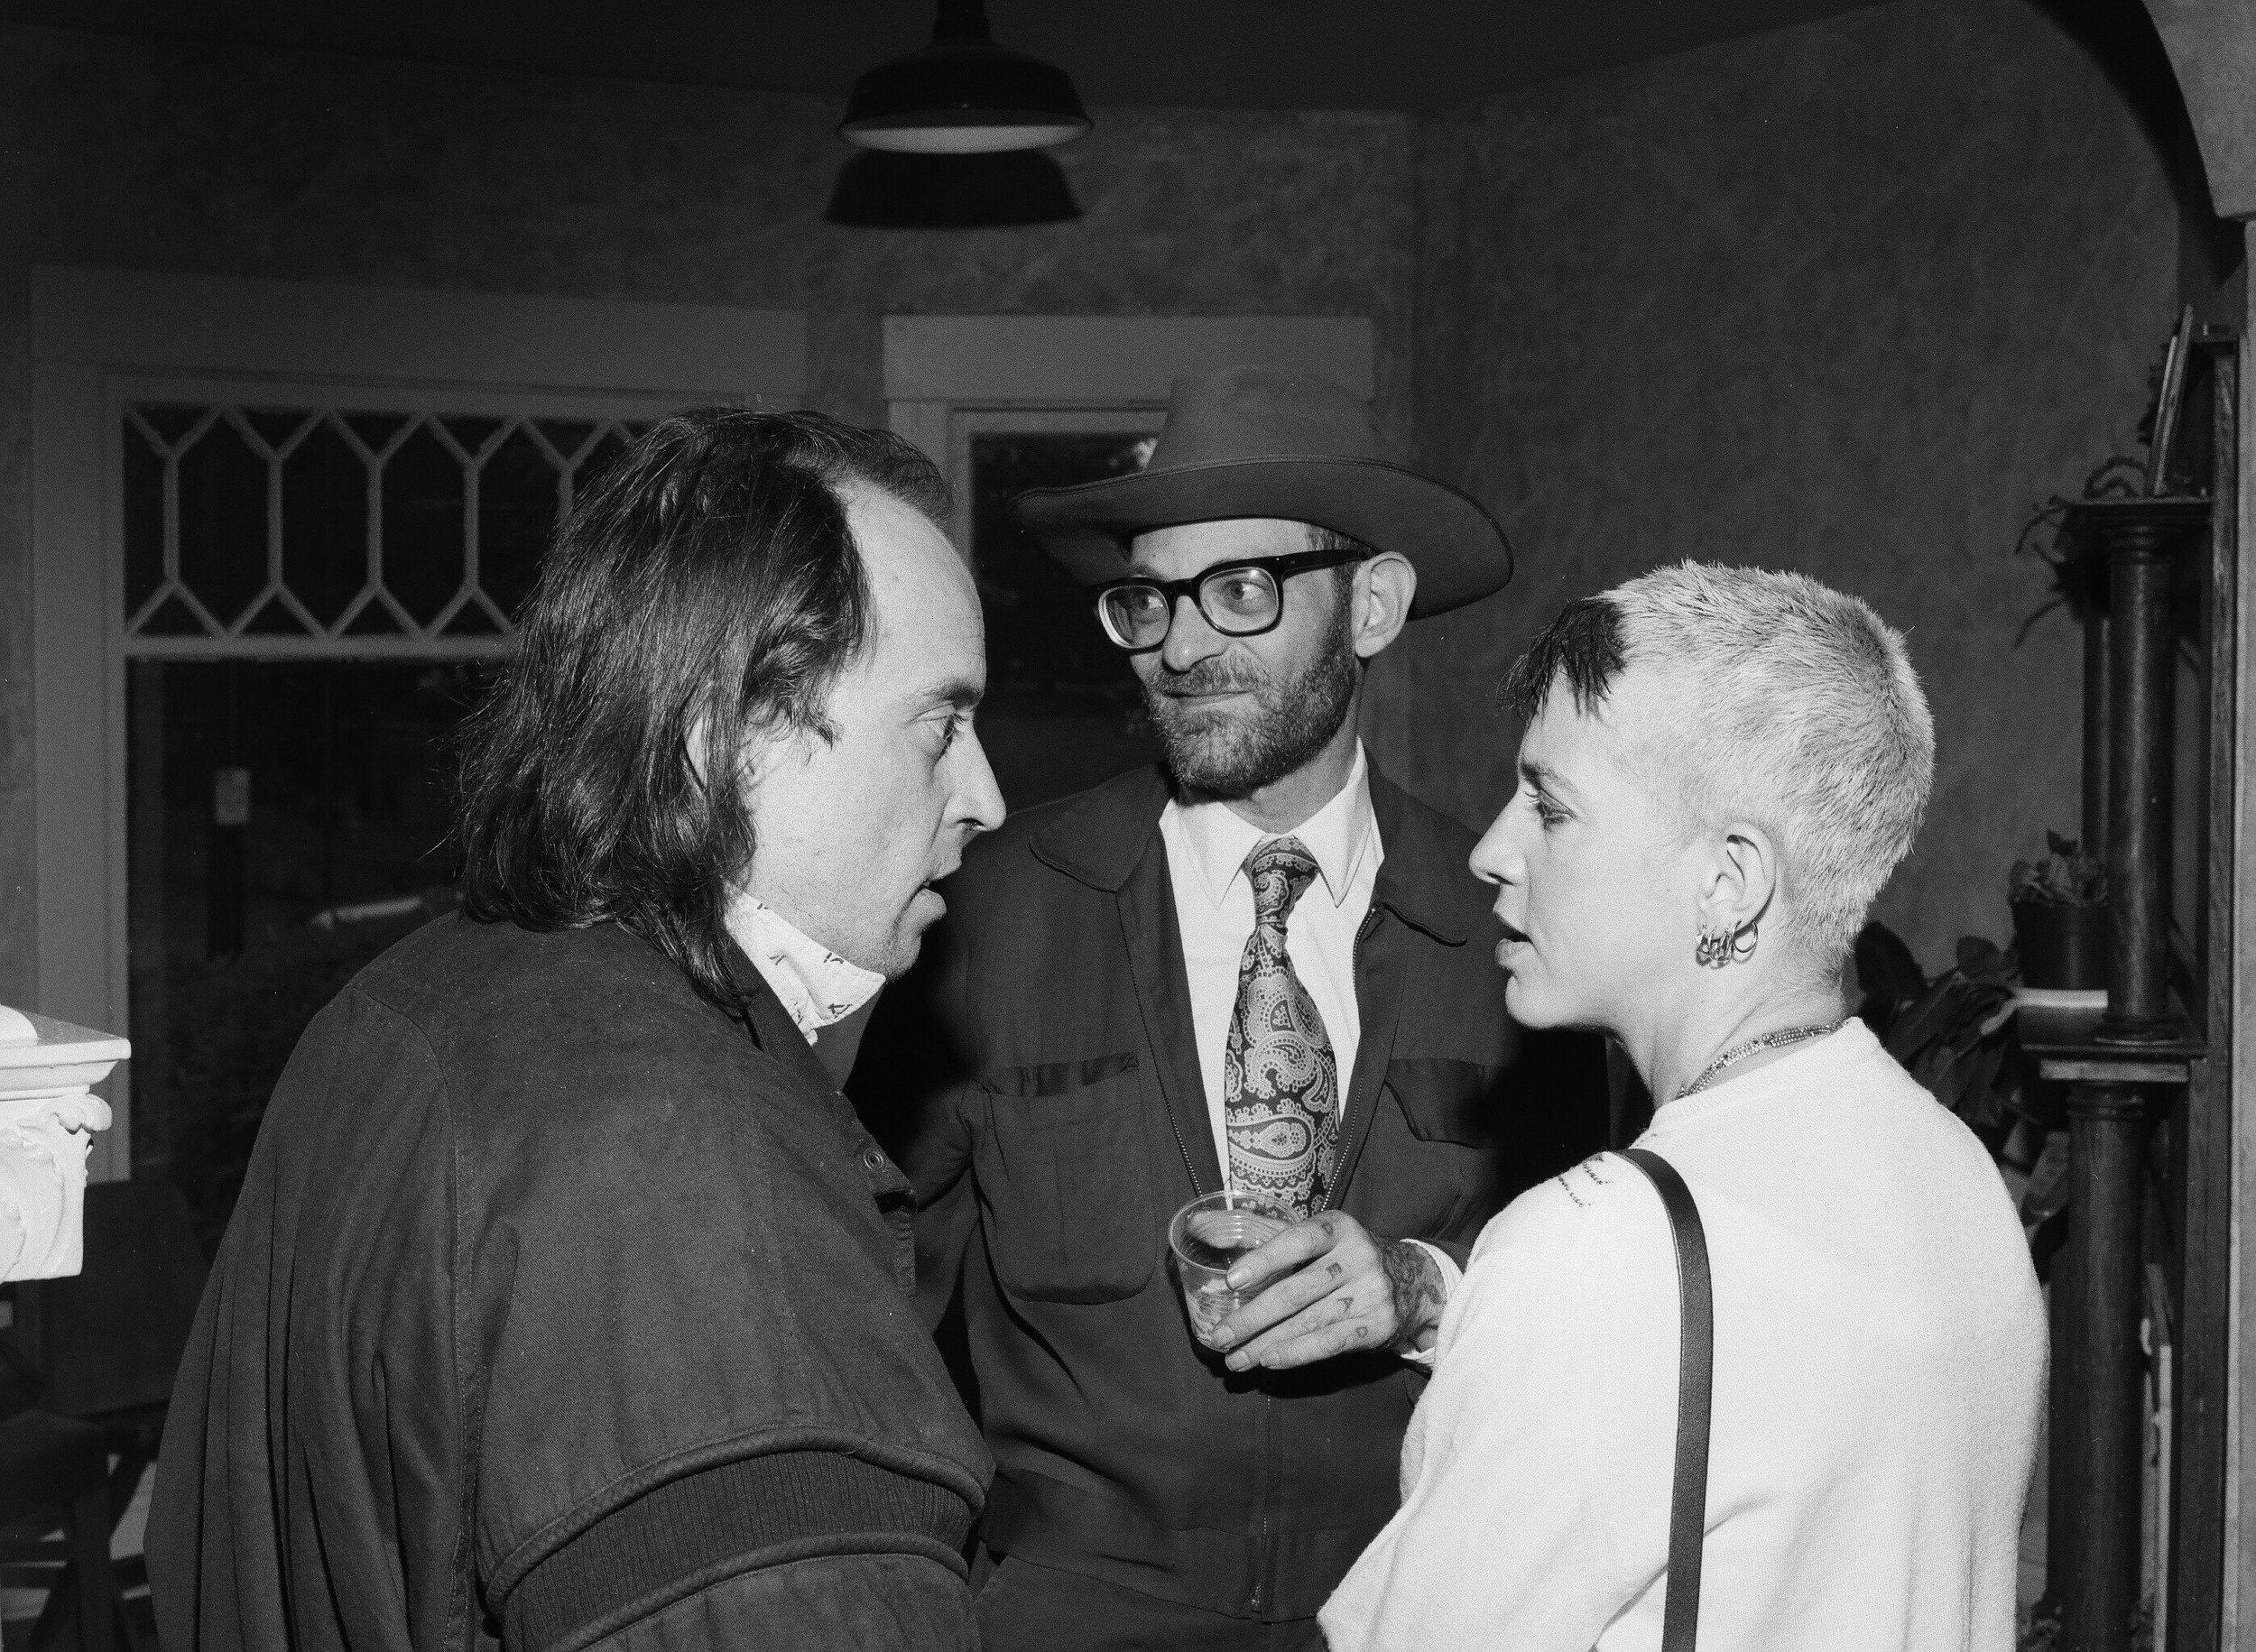 Larry Reid, Jesse Bernstein and Kathy Acker  (L to R) during Acker's COCA residency, 1989.  Photo: Larry Reid